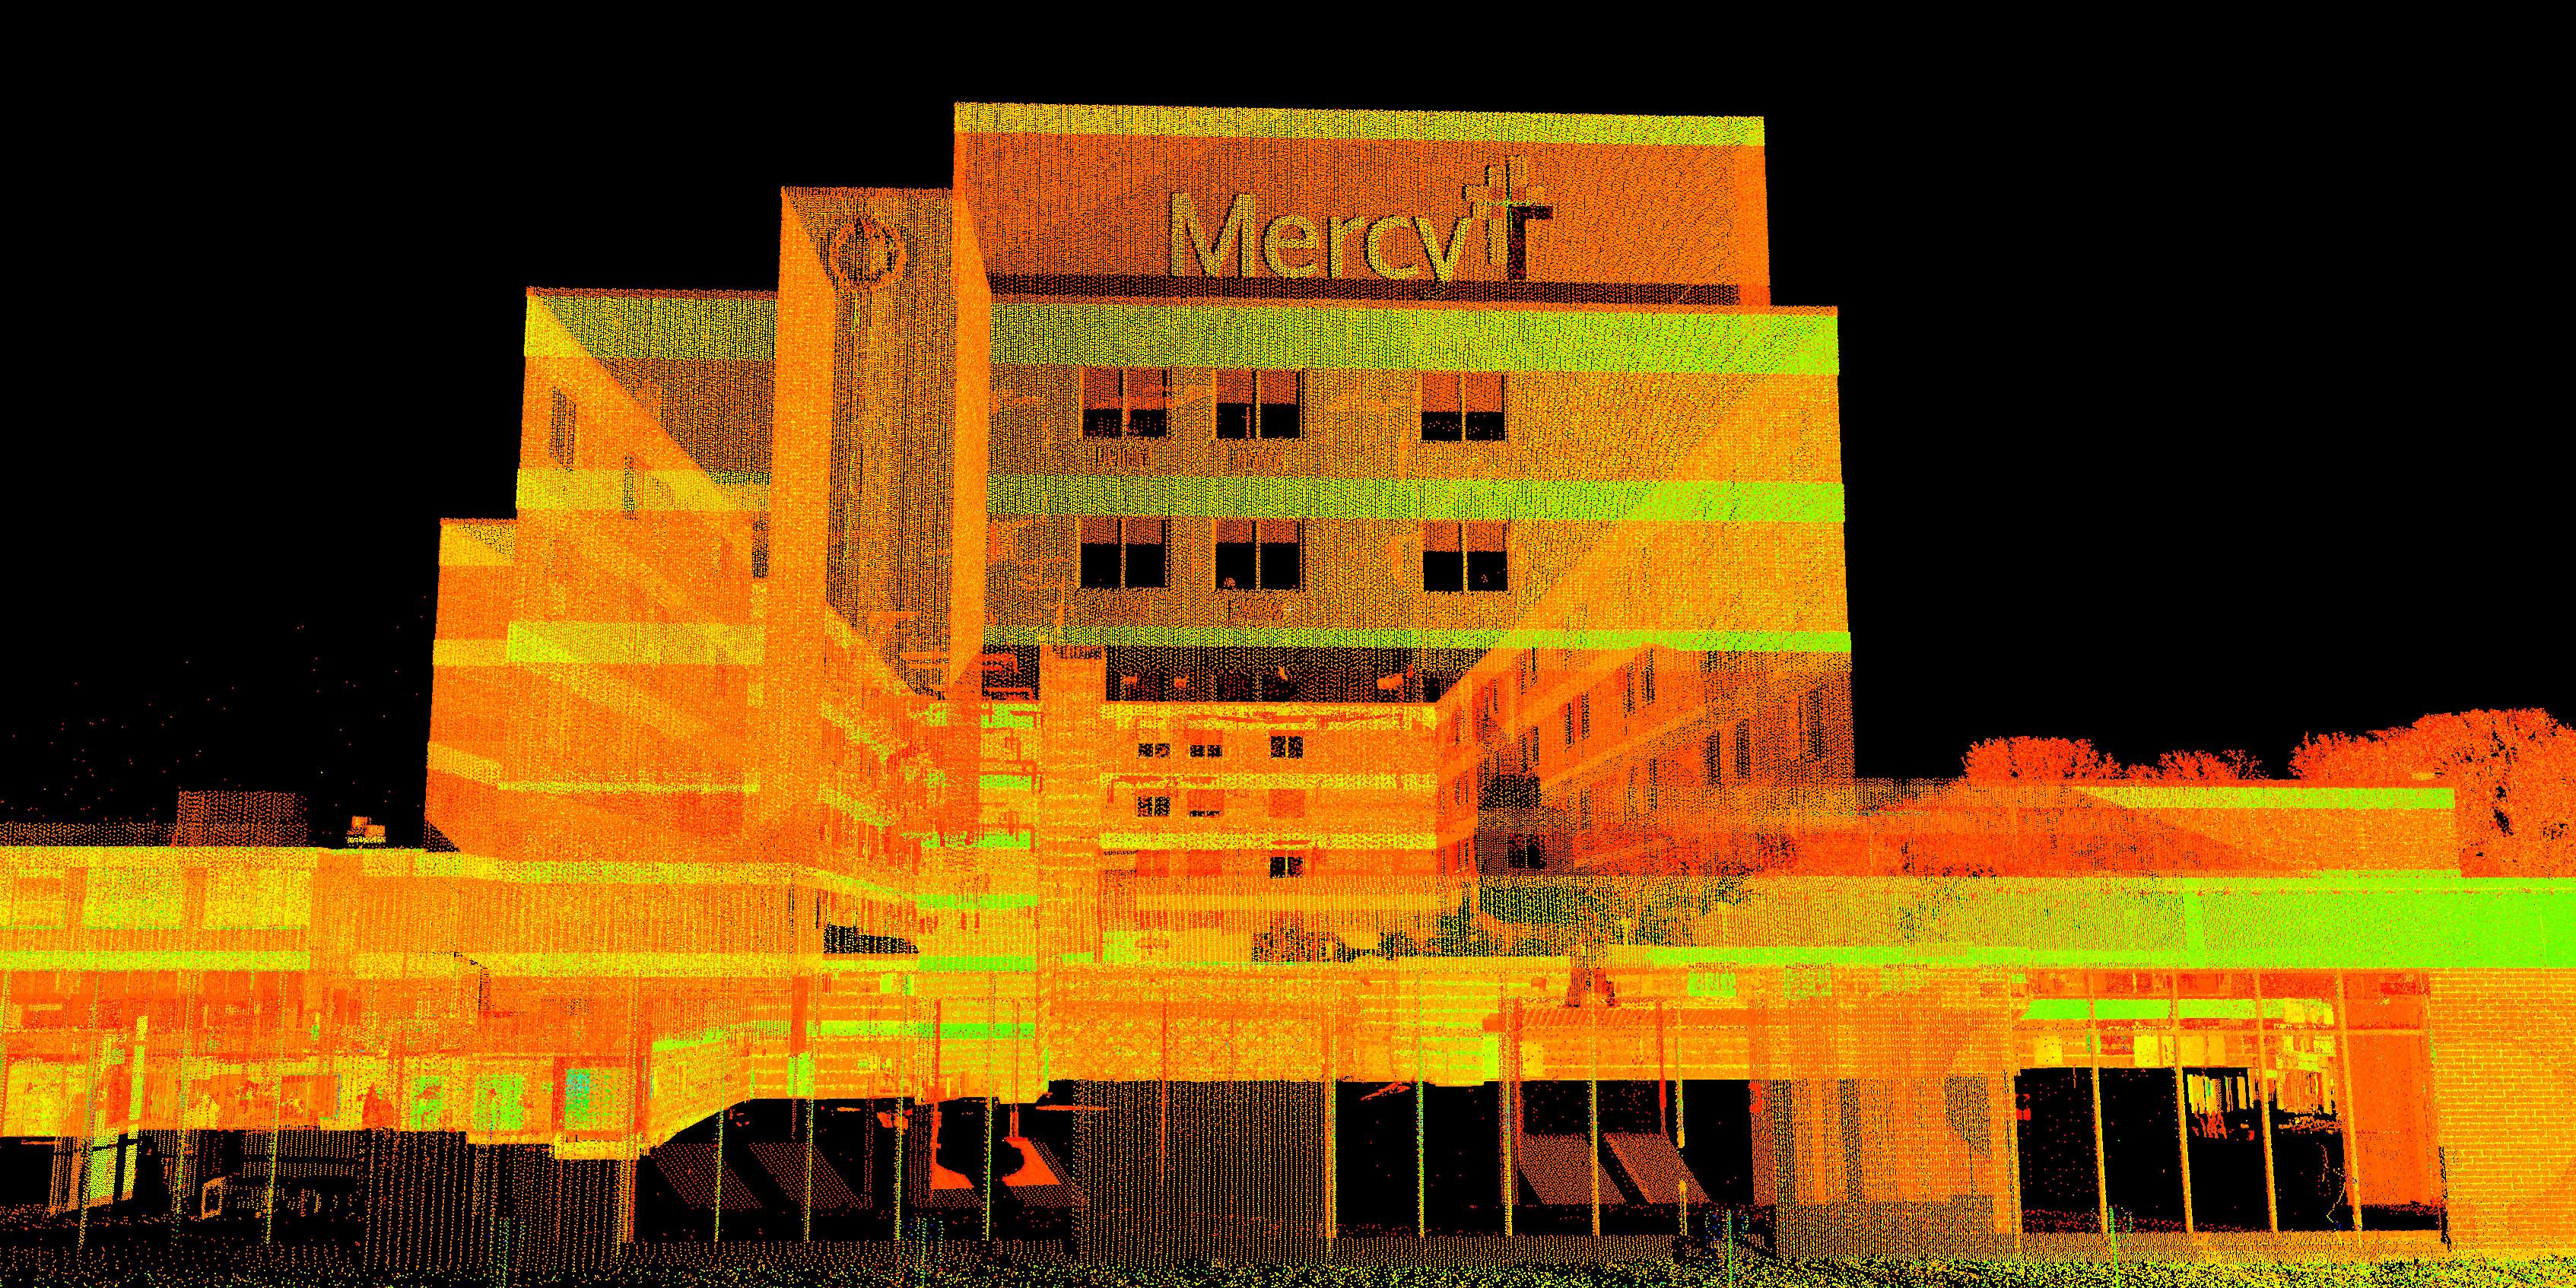 Hospital 3D Laser Scanning - Healthcare Engineering - TWM, Inc.